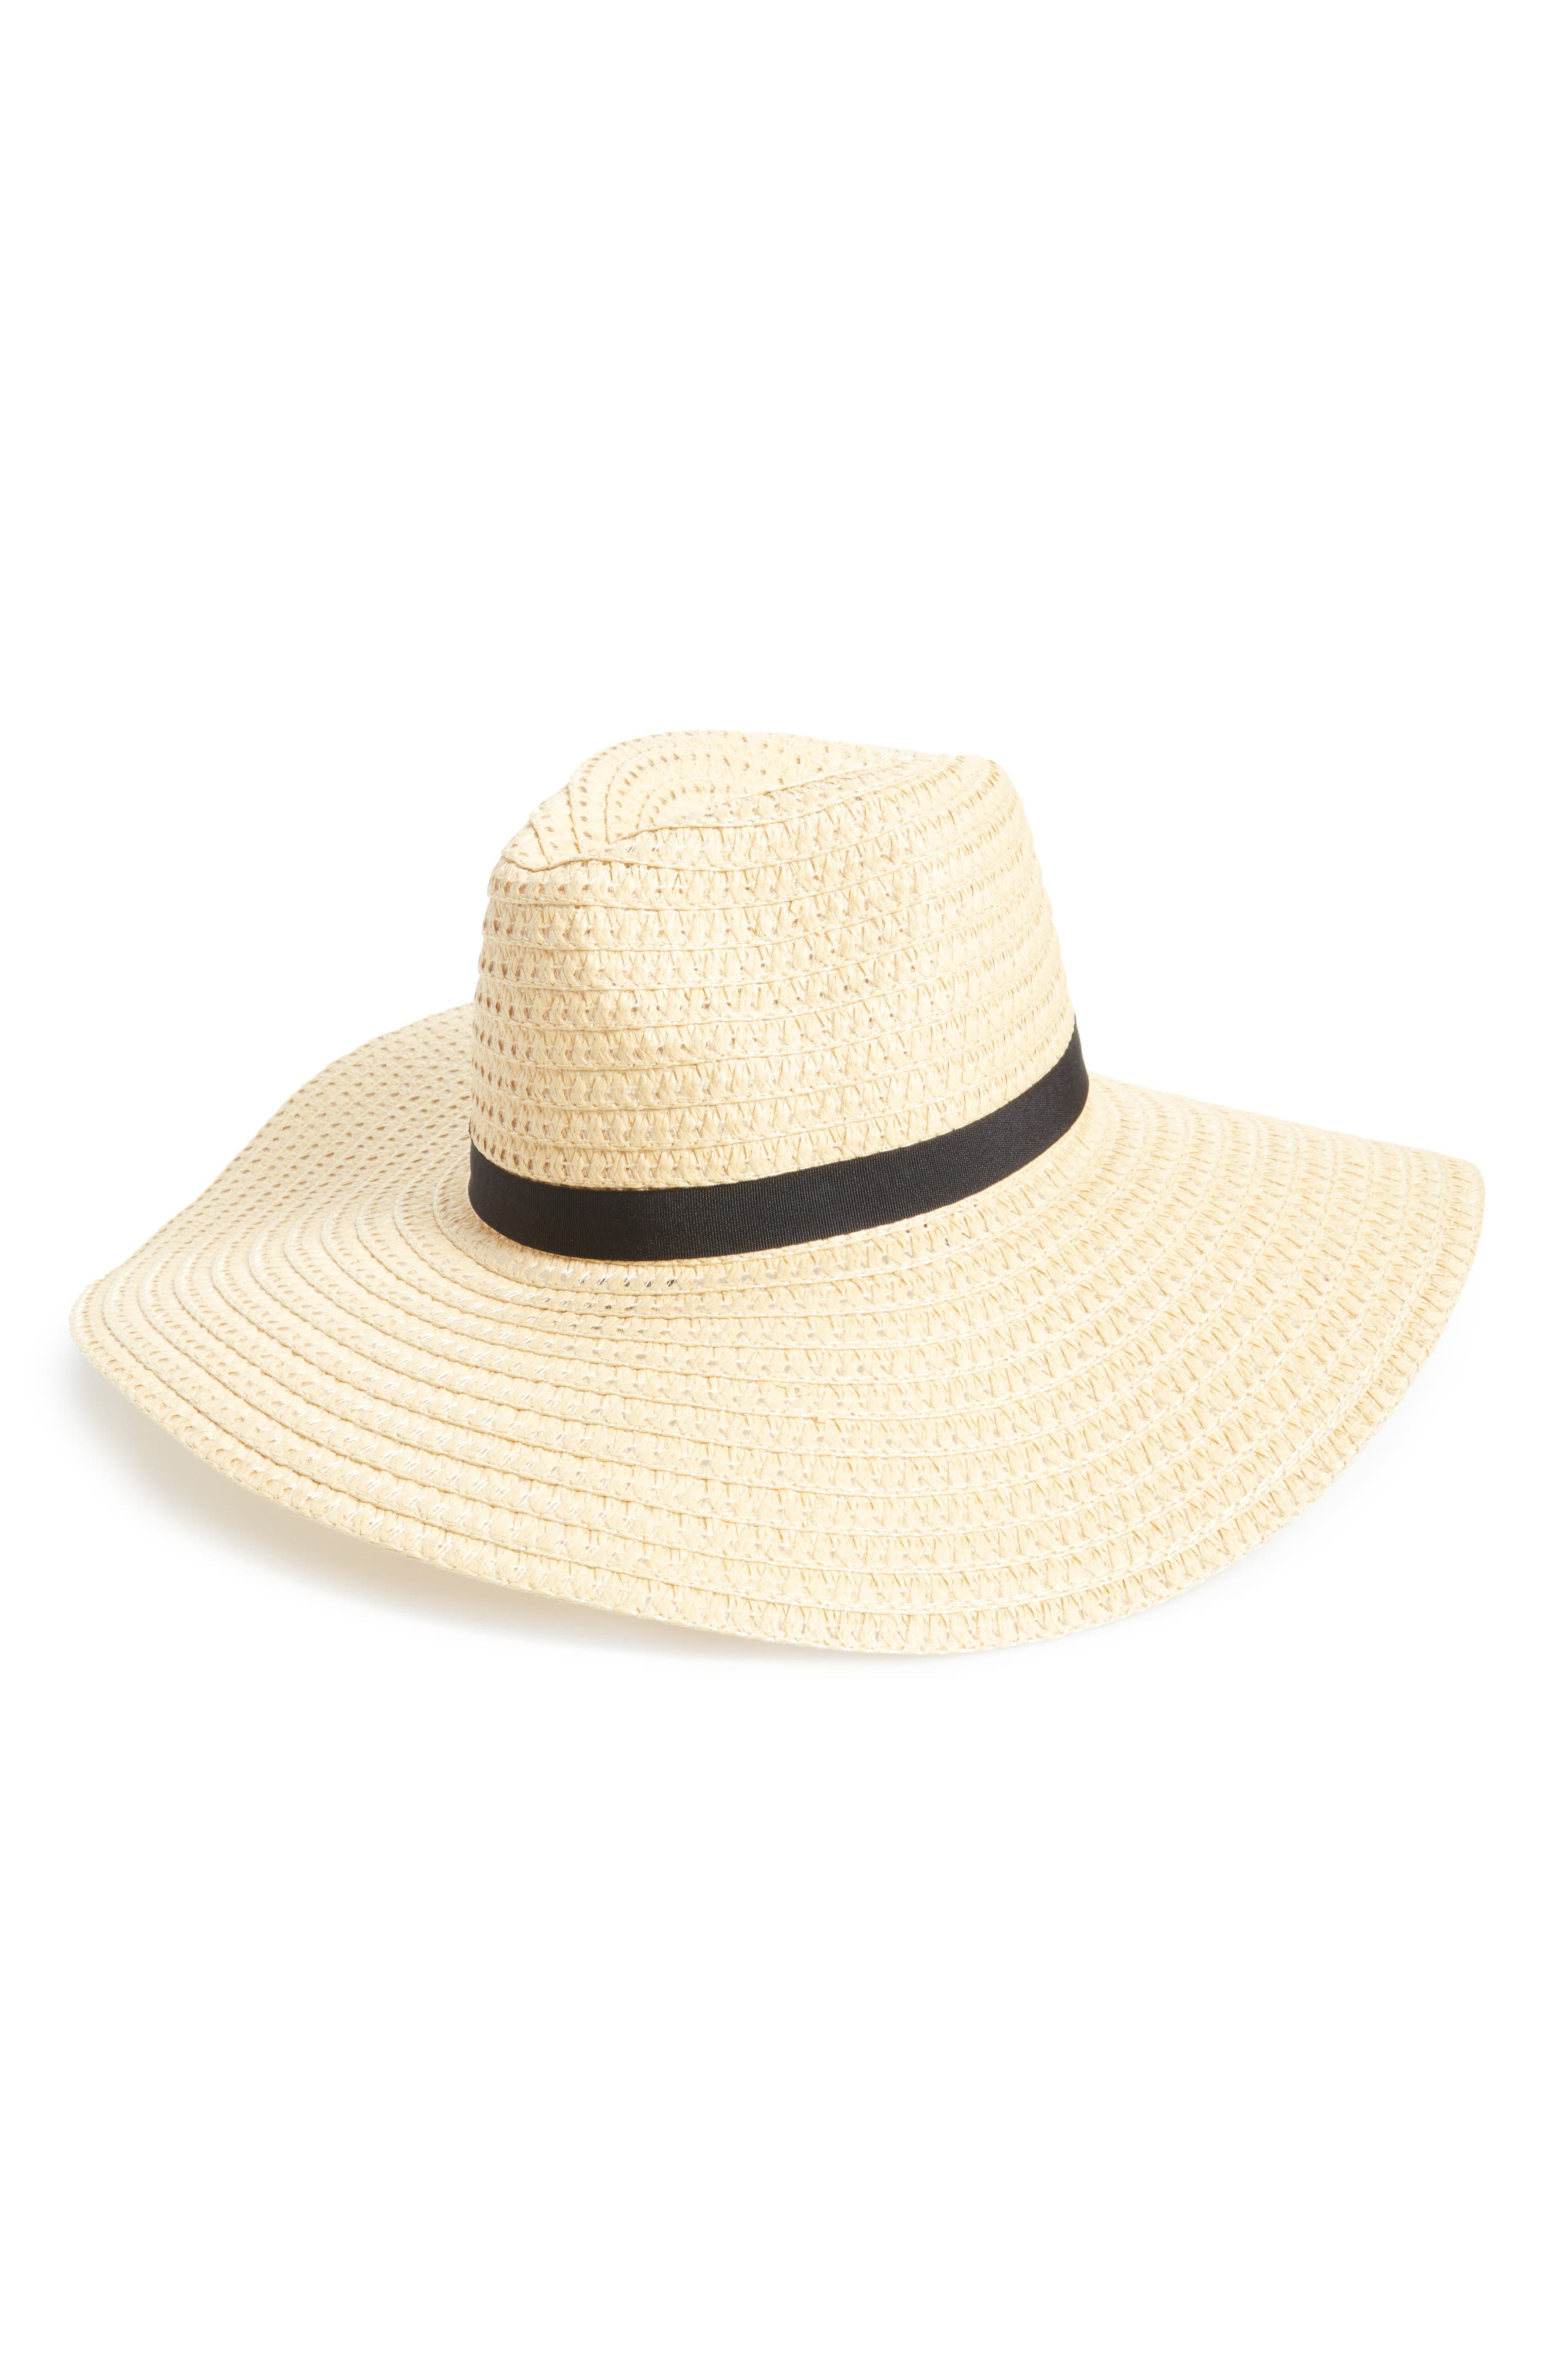 Wide Brim Staw Hat,                         Main,                         color, Natural/ Black